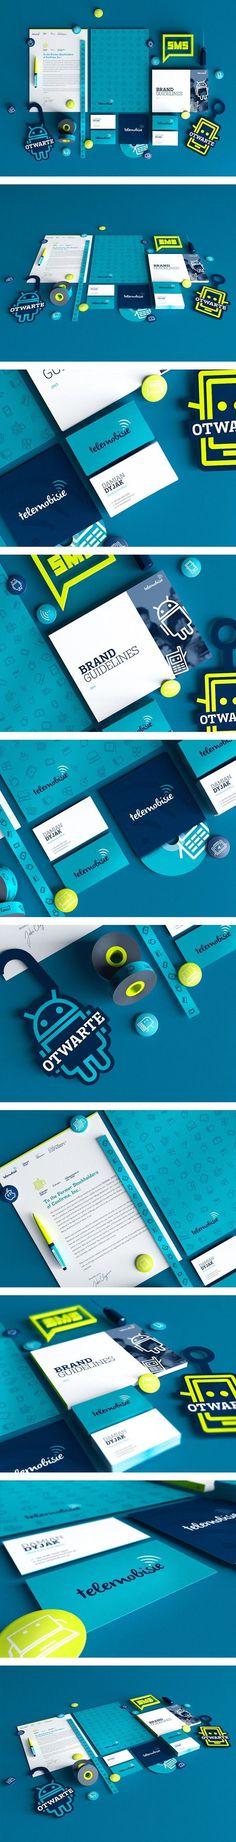 branding #identity #branding